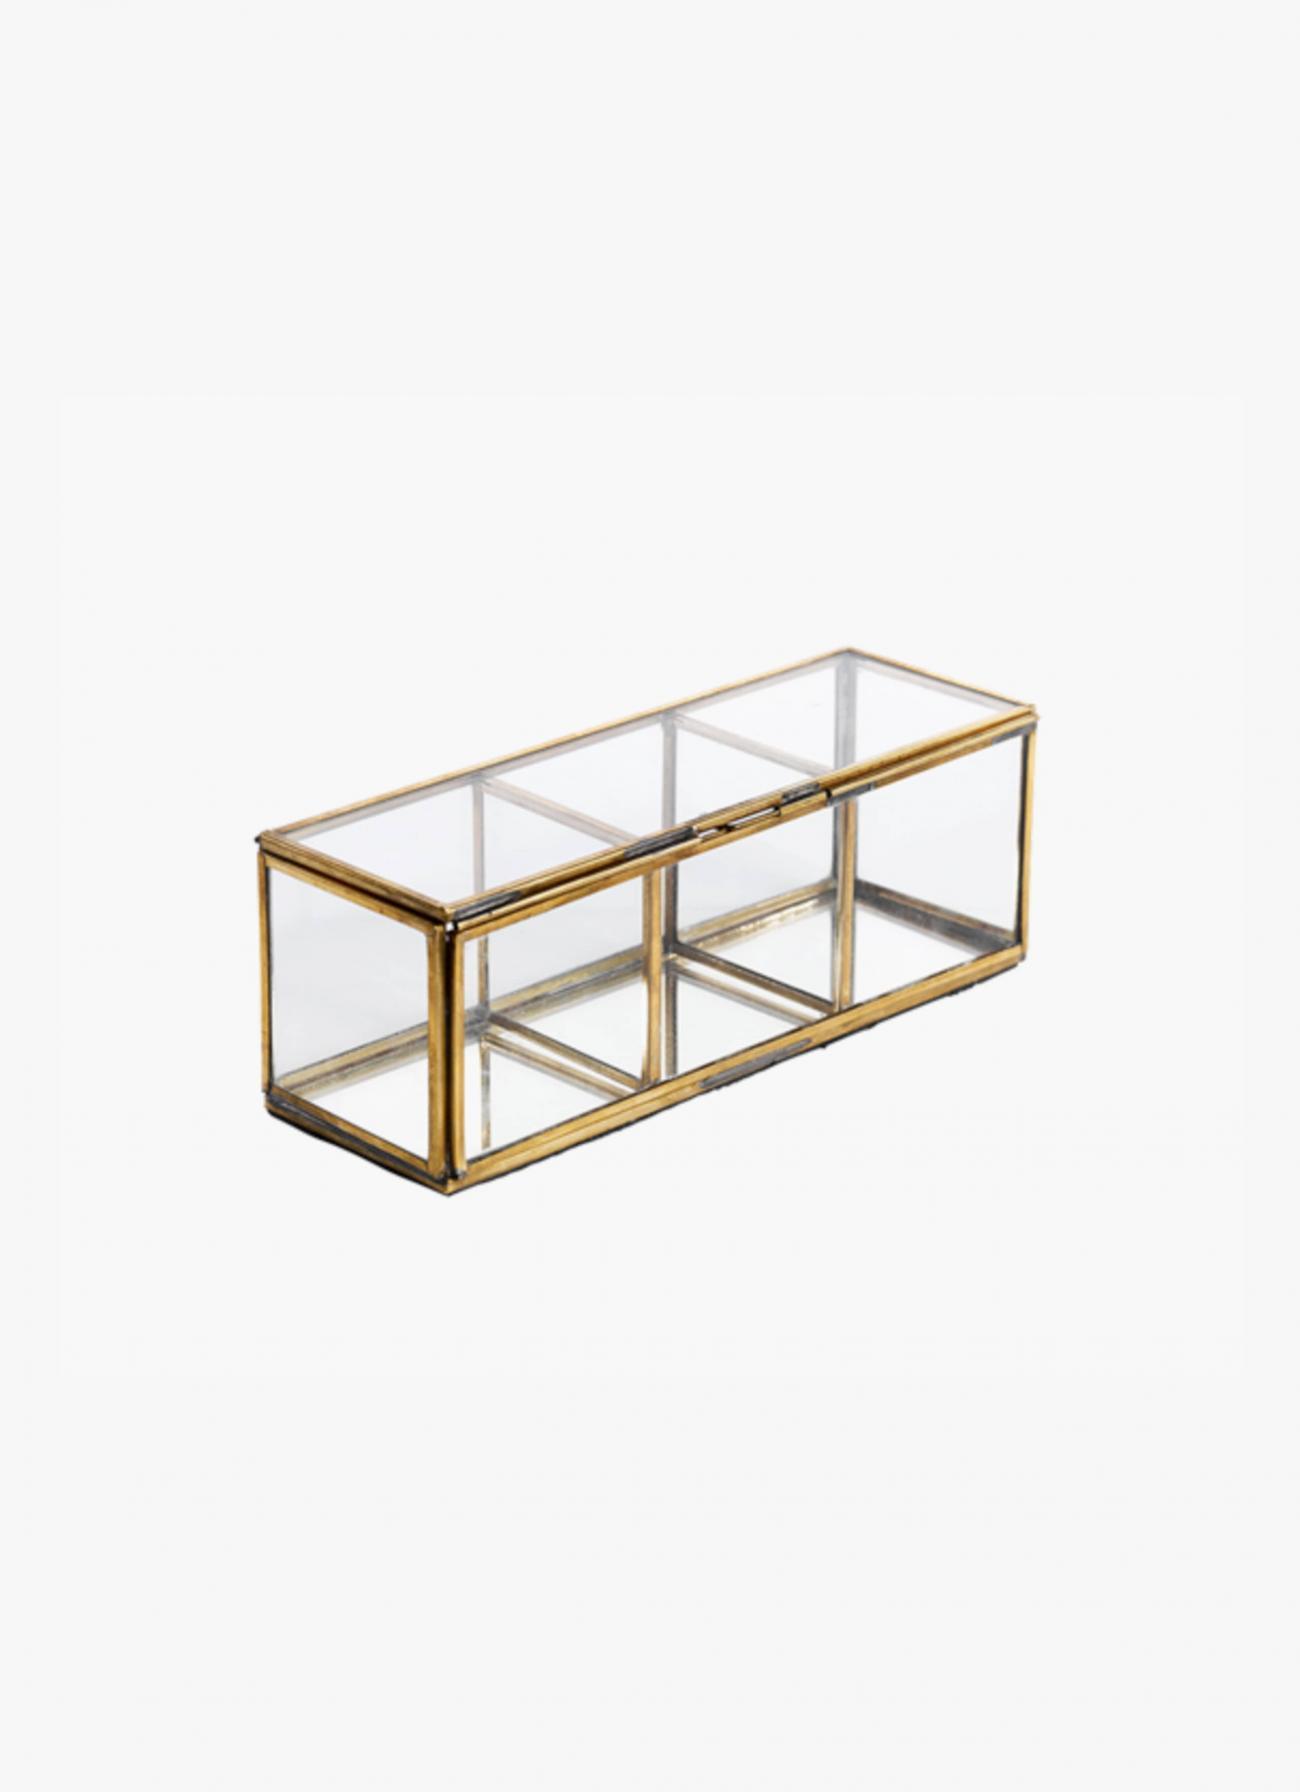 Nkuku - Antique Brass and Glass - Divider Box